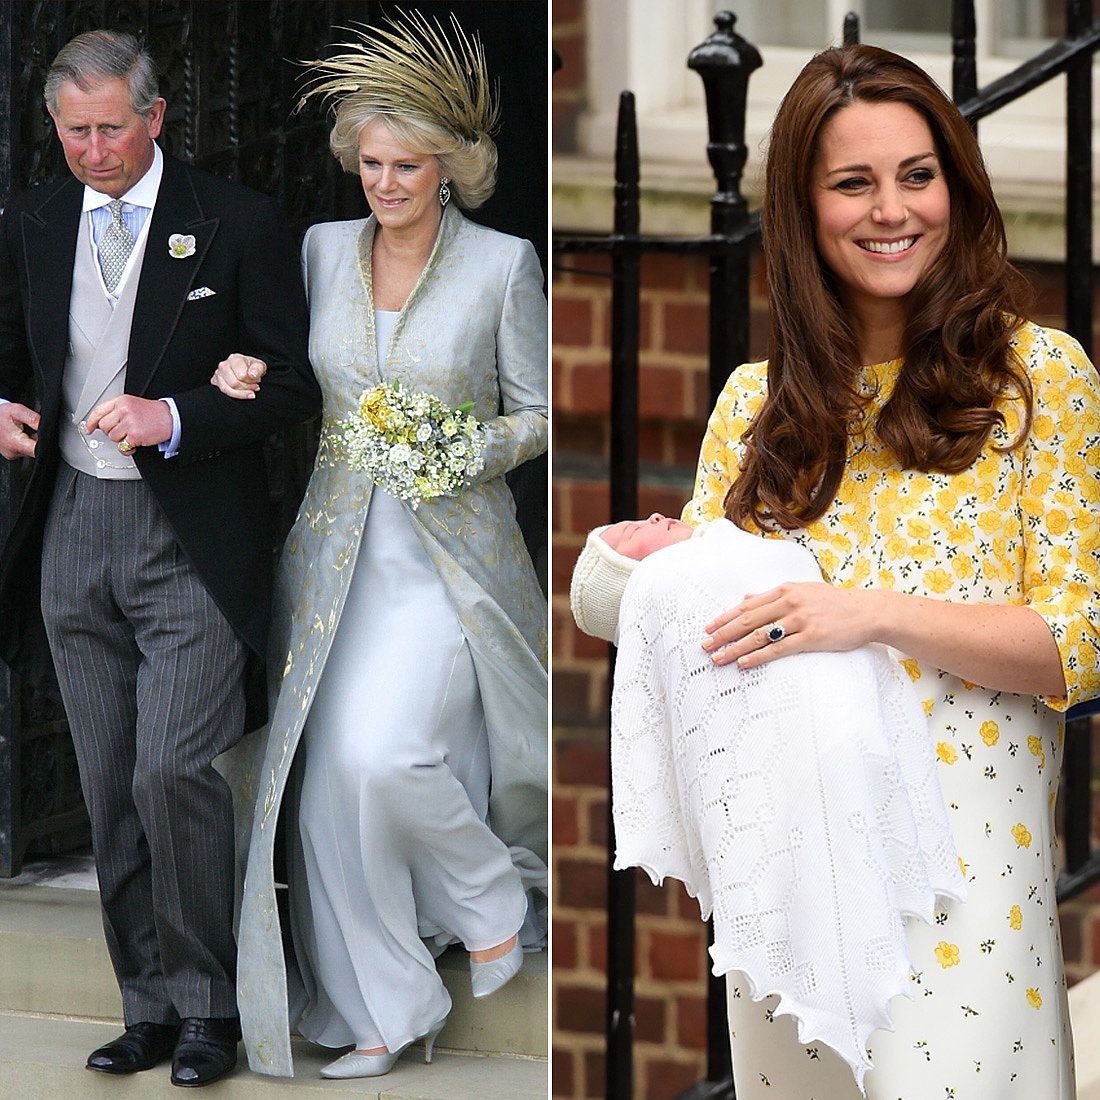 The Royal Family Wedding dresses, Civil ceremony, Dresses